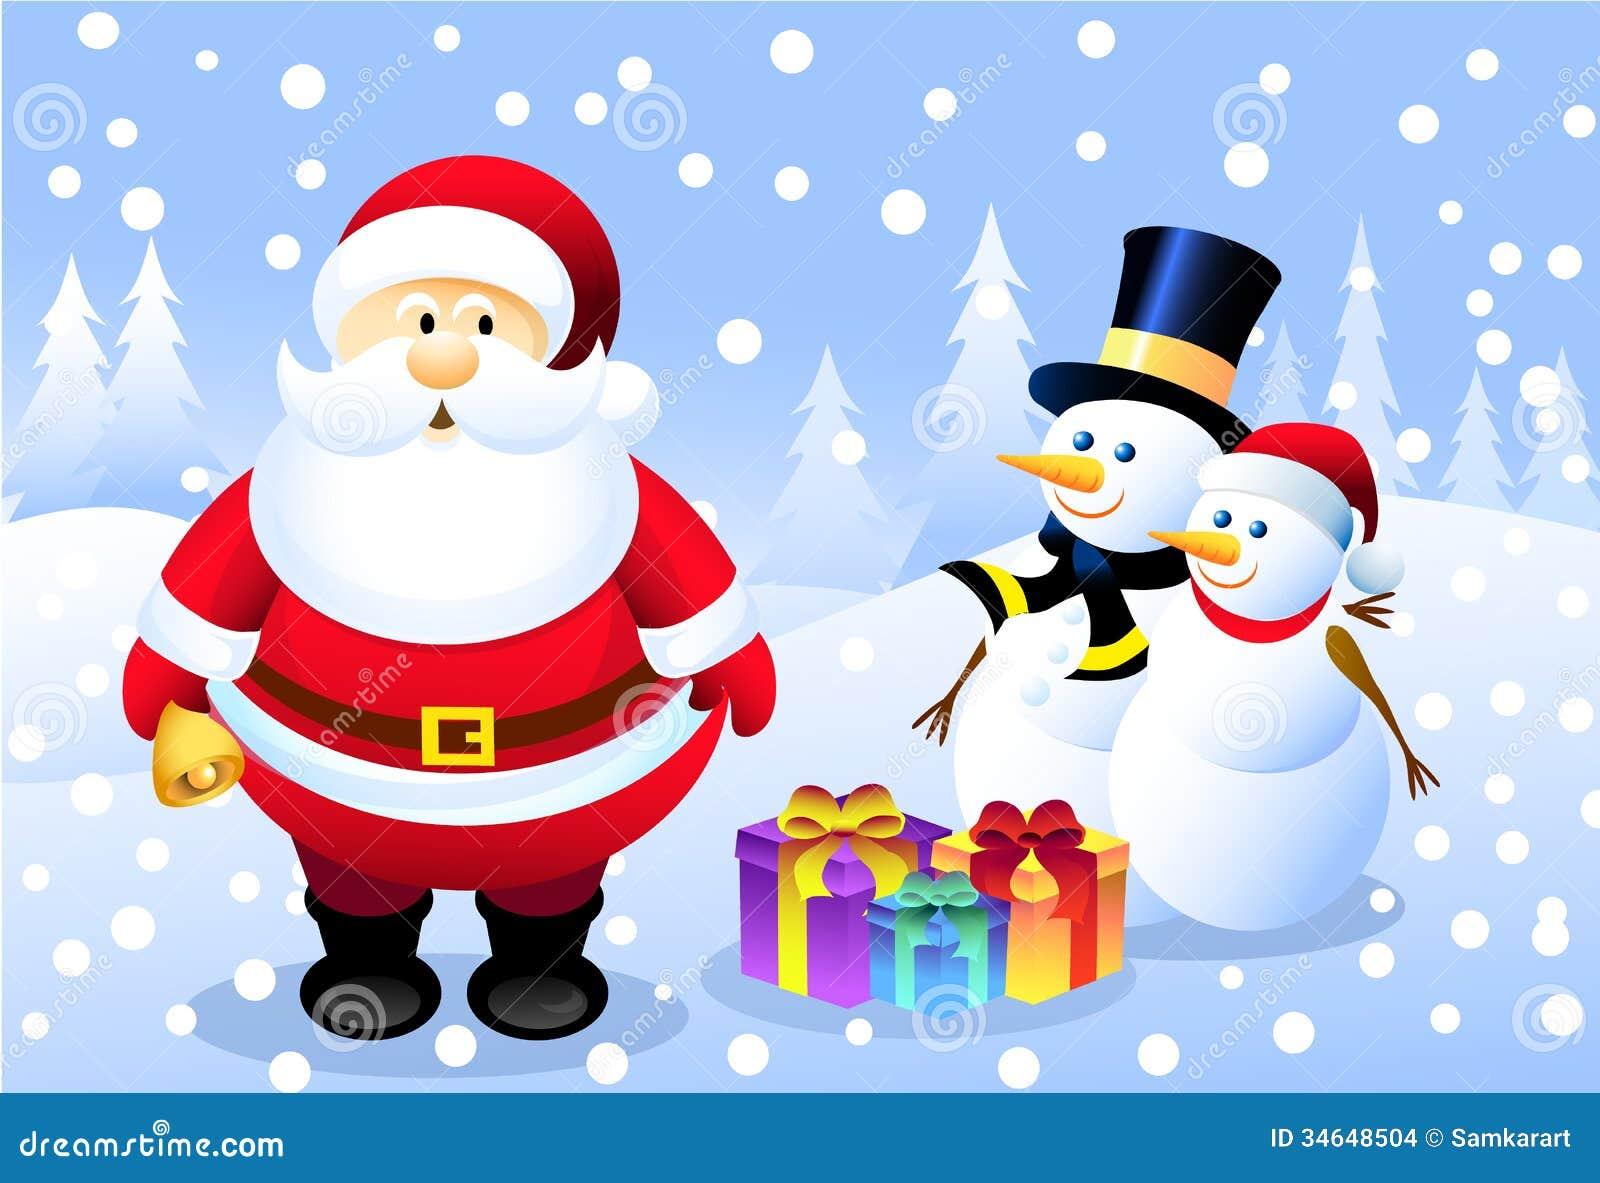 santa mr mrs snowman - Snowman Santa